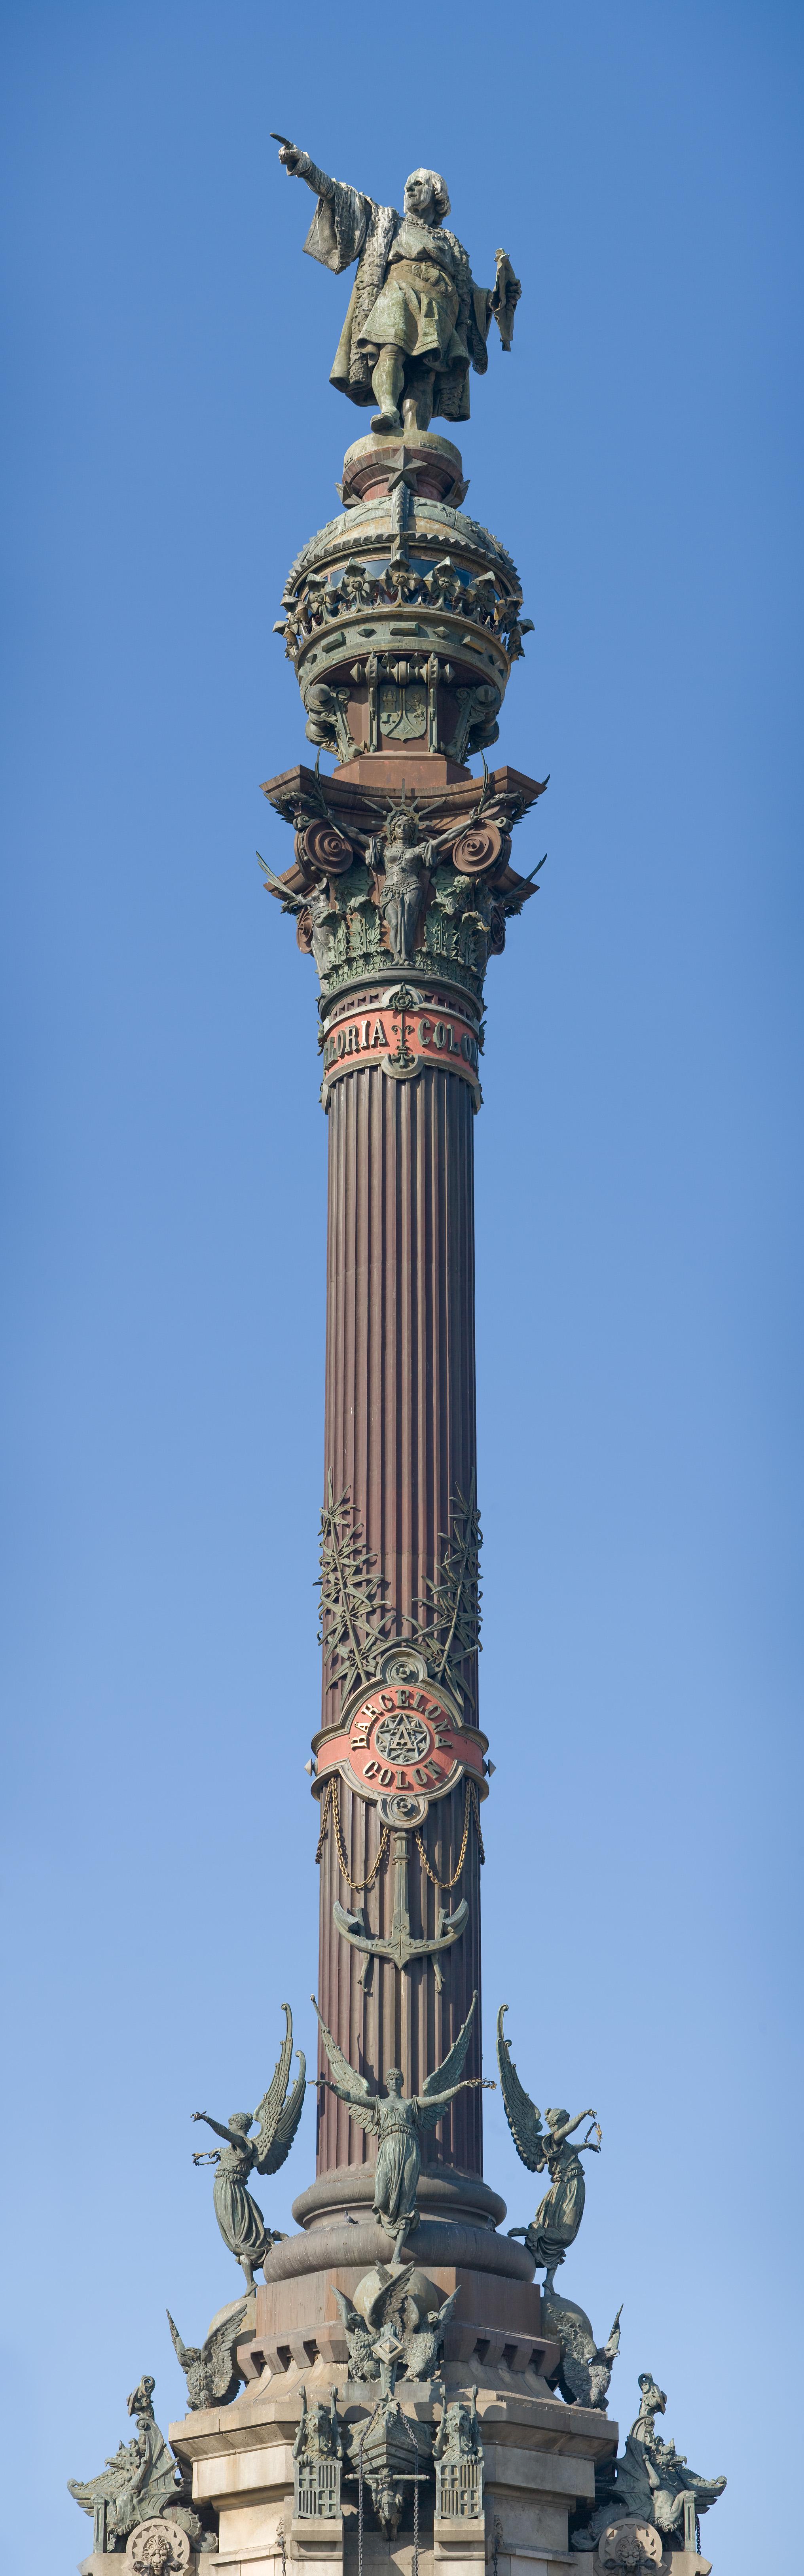 Monument a Colom, Barcelona, Spain